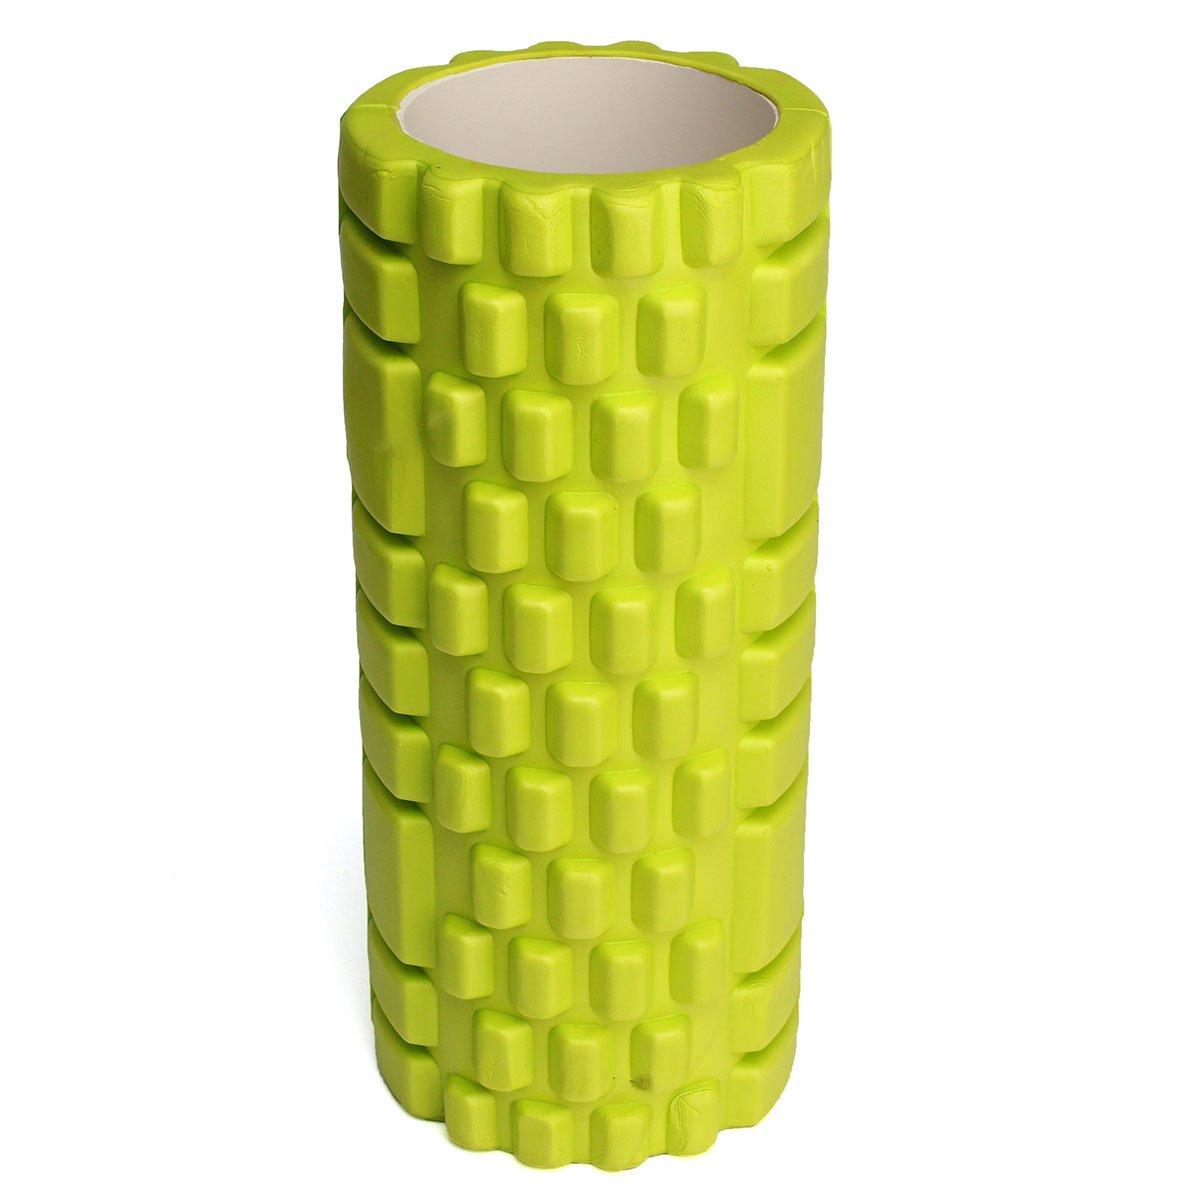 Pink Bluelover 34X14Cm Pilates Fitness Foam Roller Home Gym Massage Trigger Point